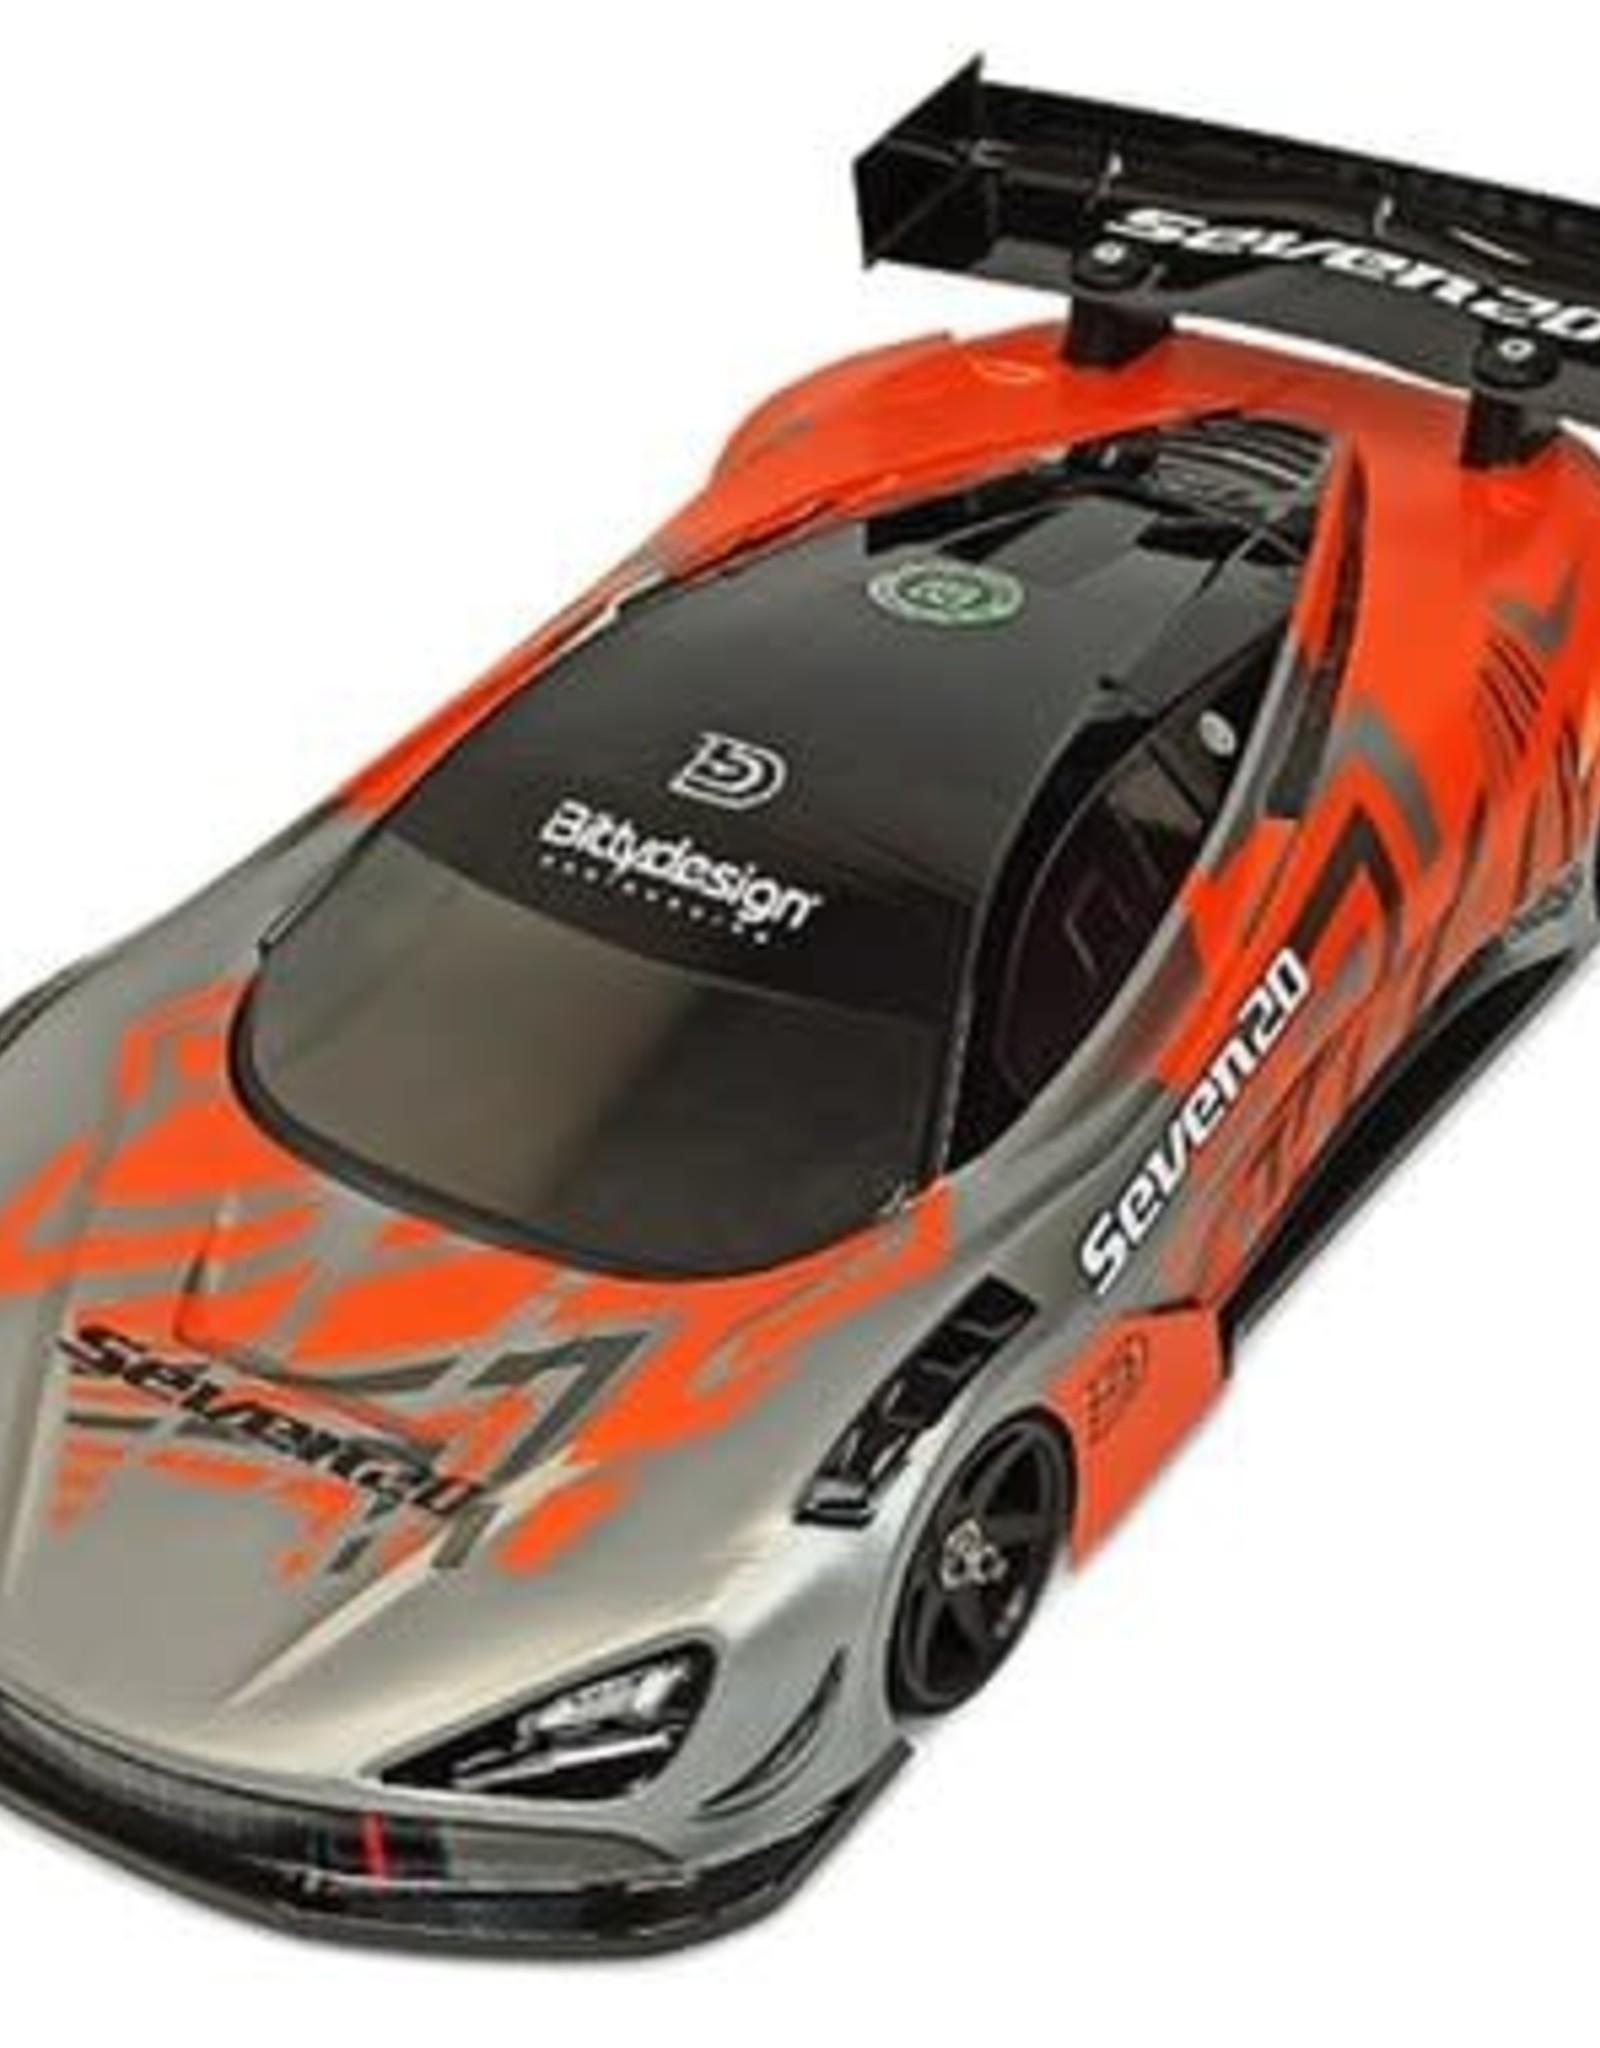 Bittydesign Bittydesign Seven20 GT12 1/12 On-Road Body